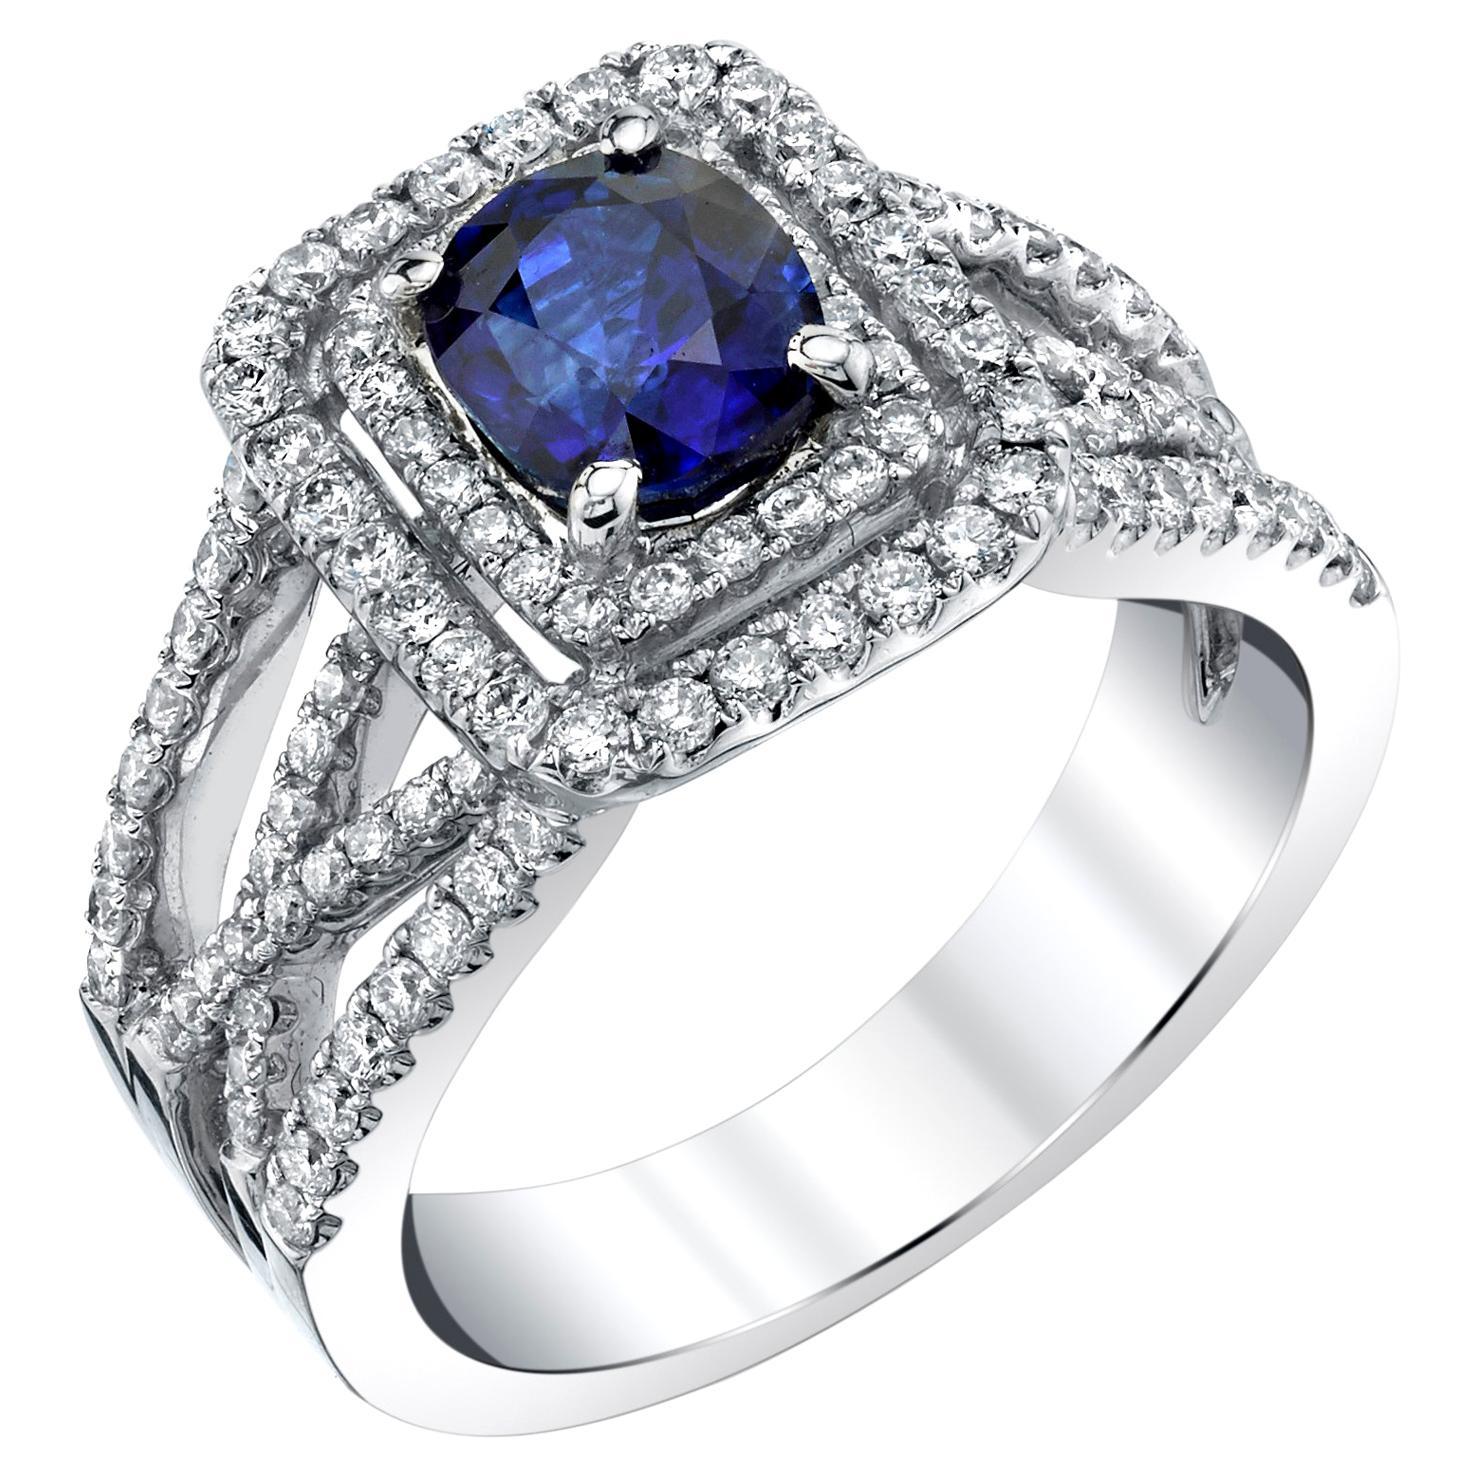 1.69 ct. Blue Sapphire, 18k White Gold, Diamond Set Wraparound Engagement Band